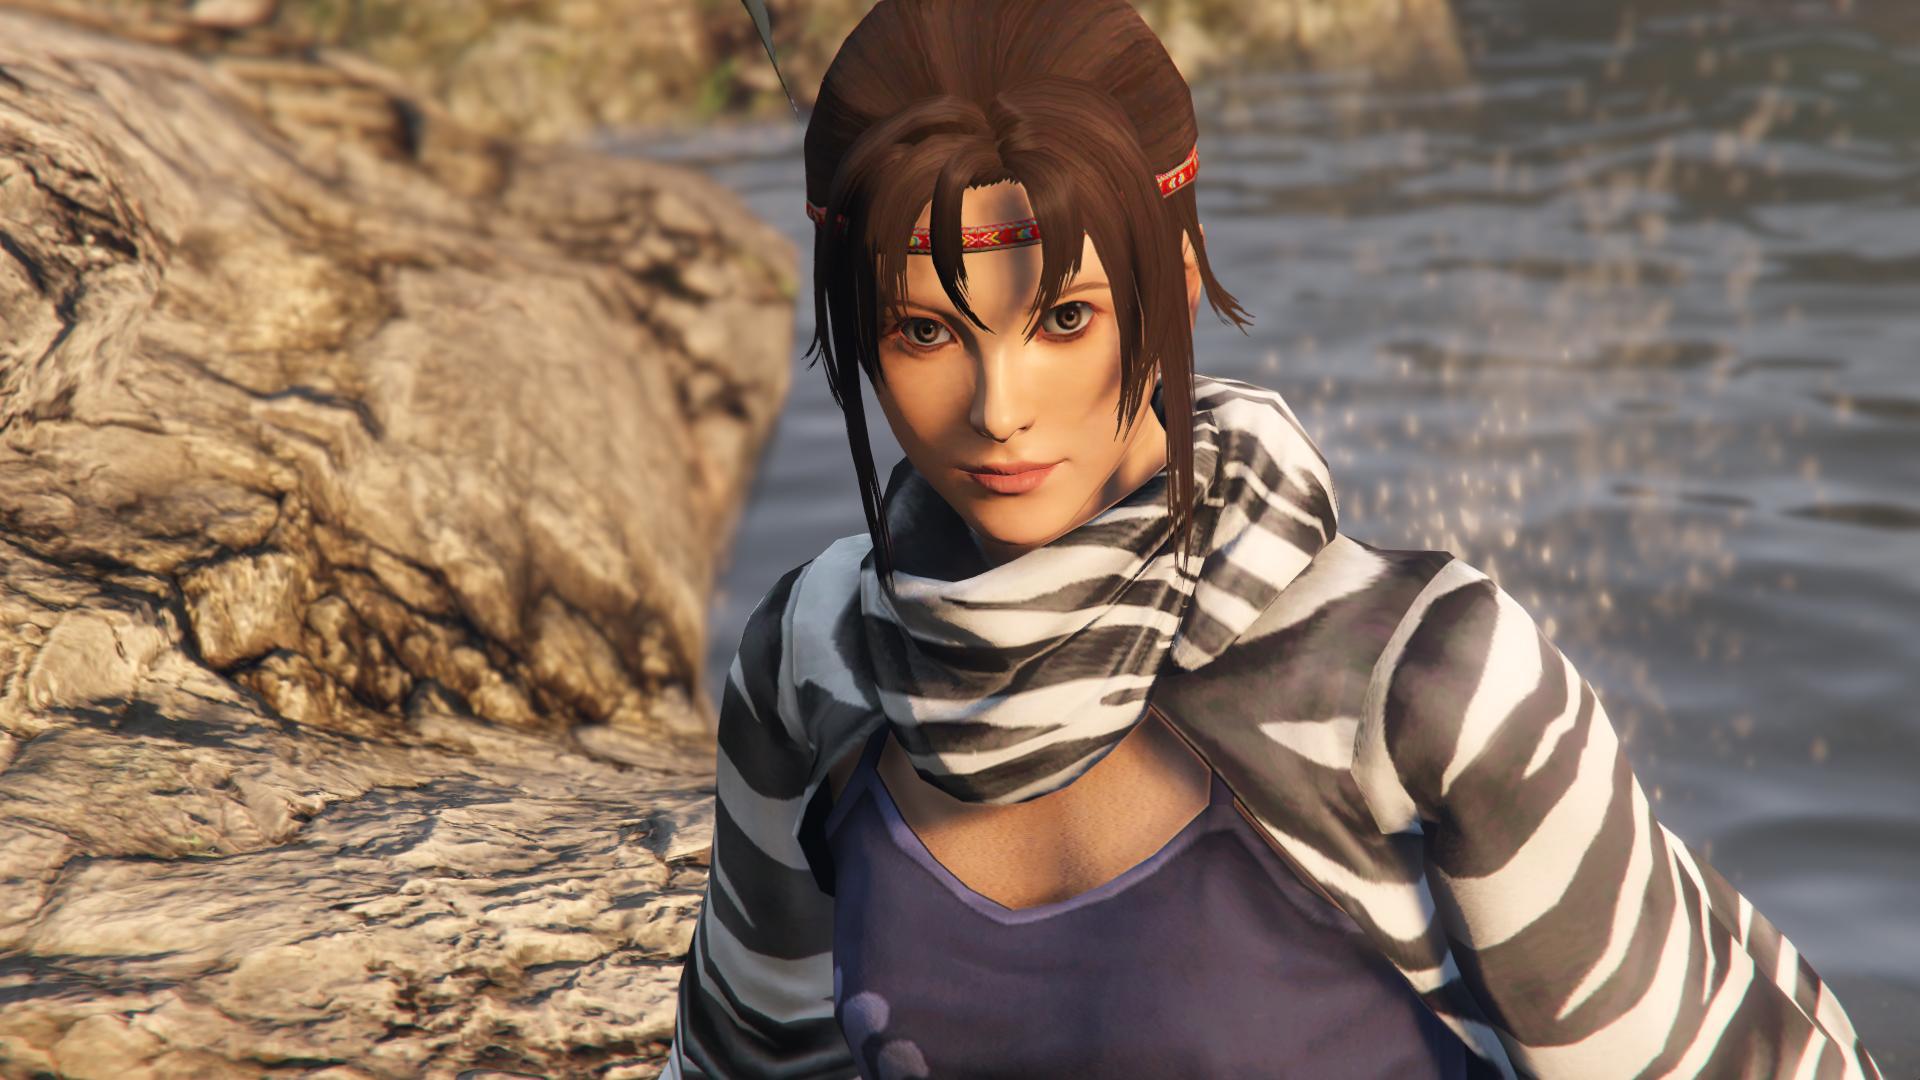 Michelle Chang Tekken Add On Ped Replace Gta5 Mods Com